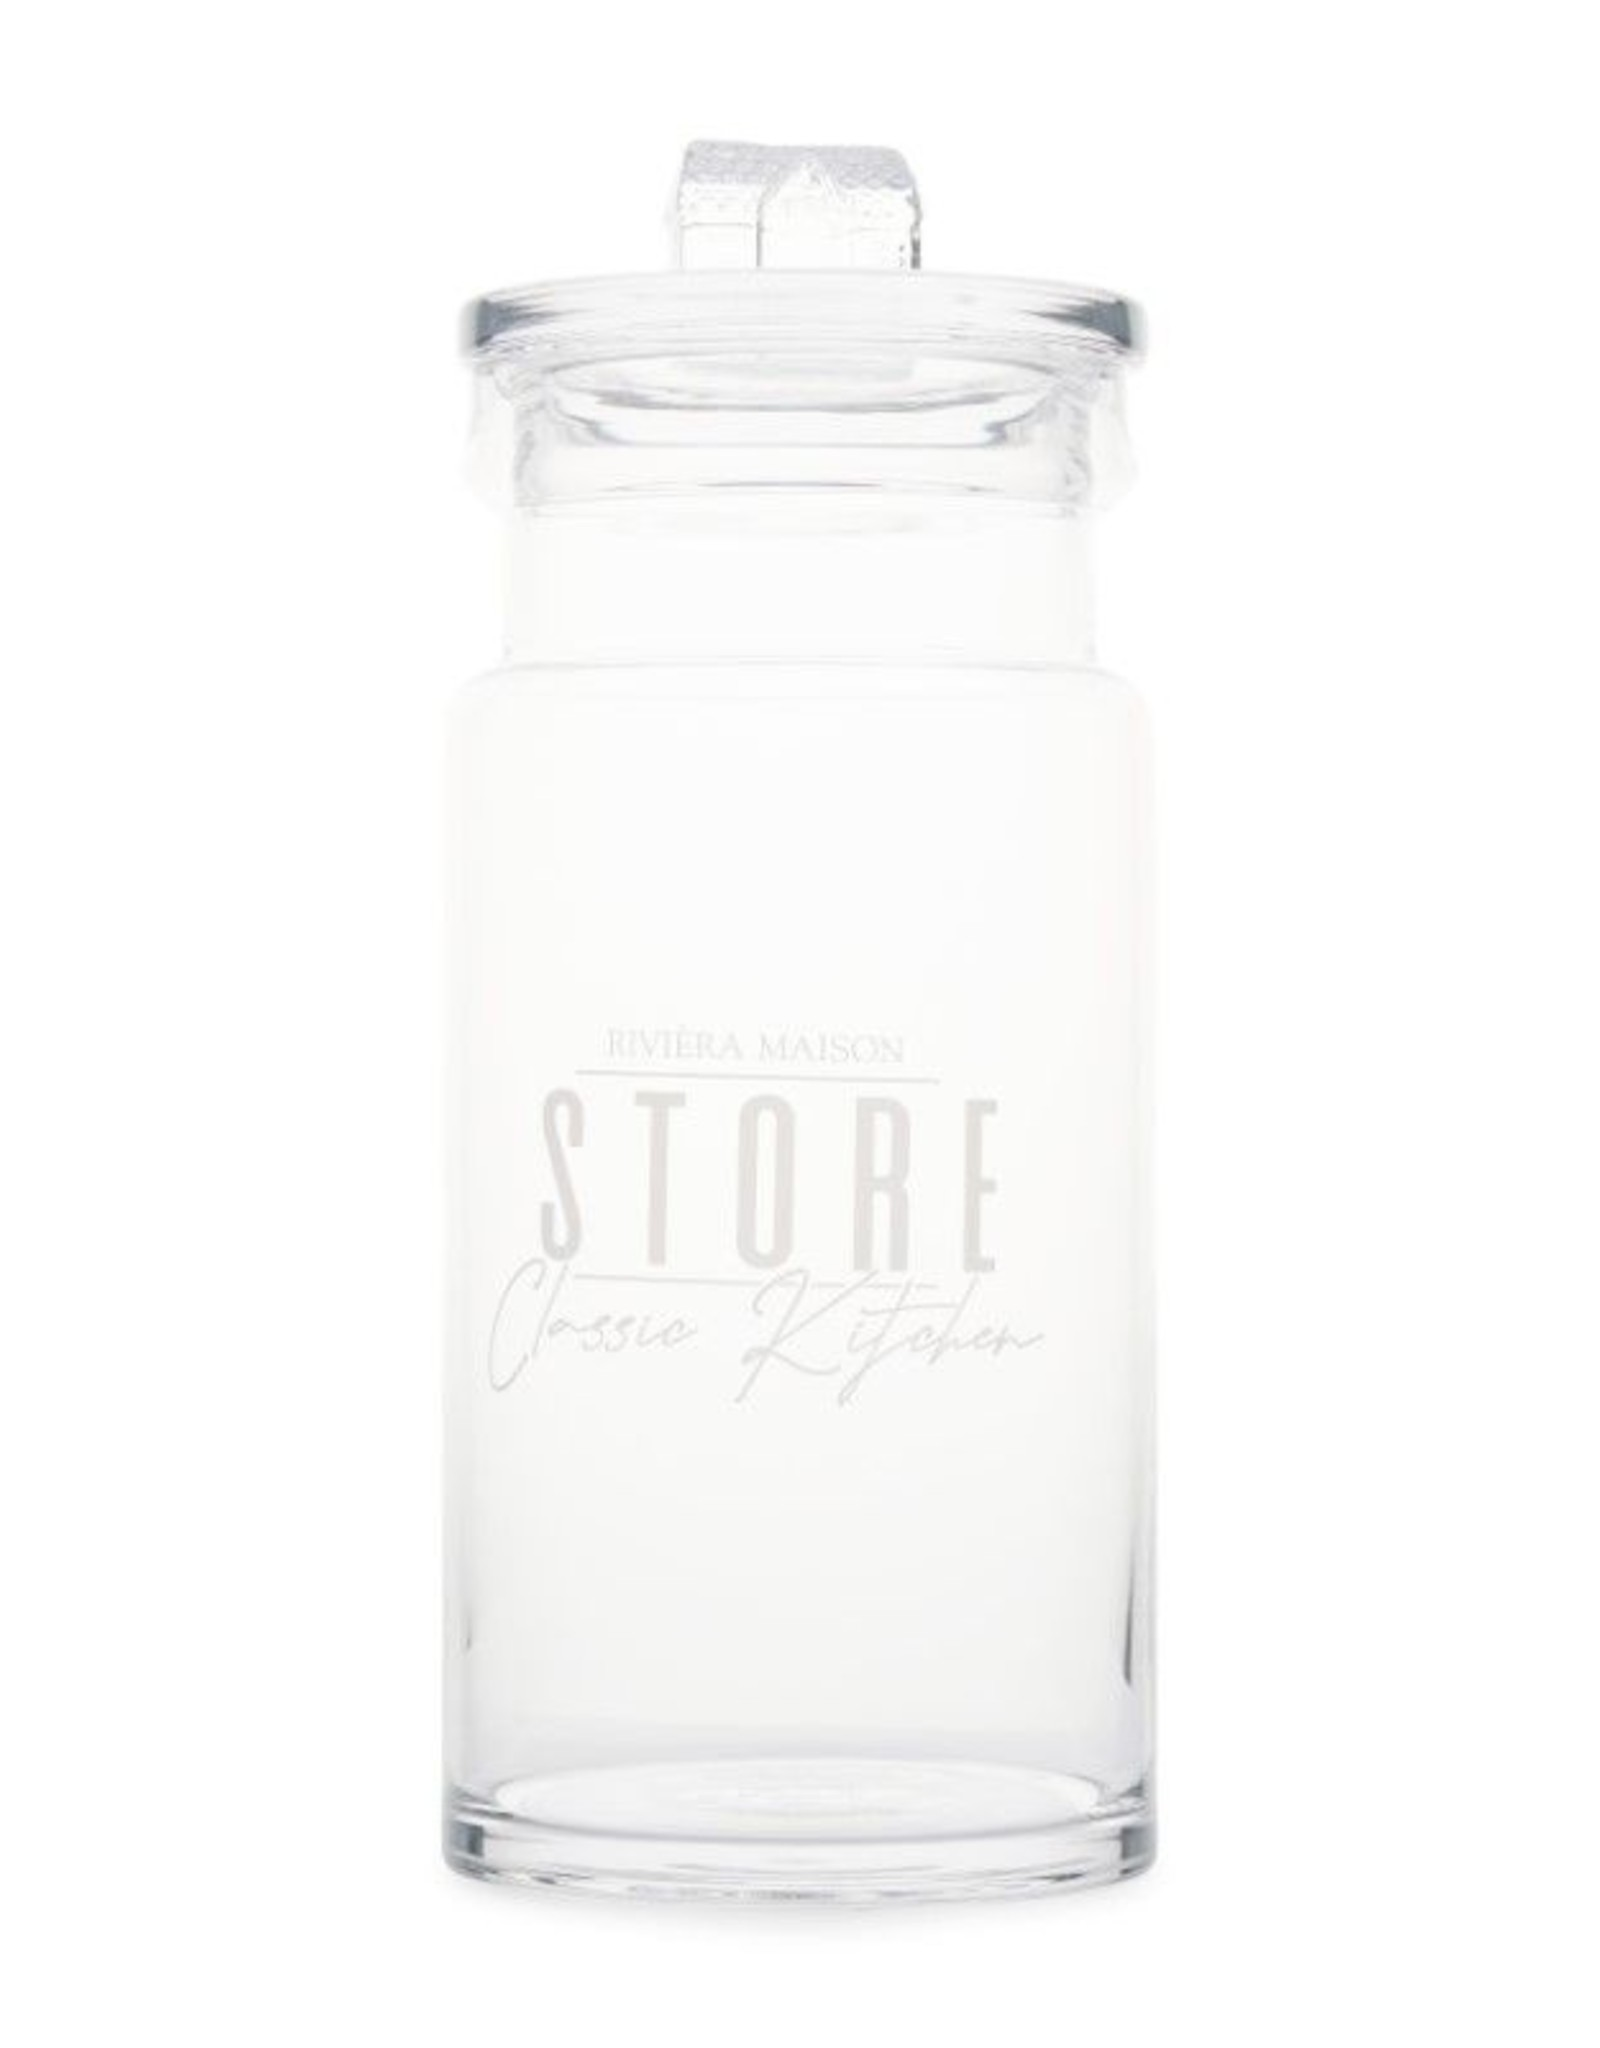 Riviera Maison Classic Kitchen Storage Jar L